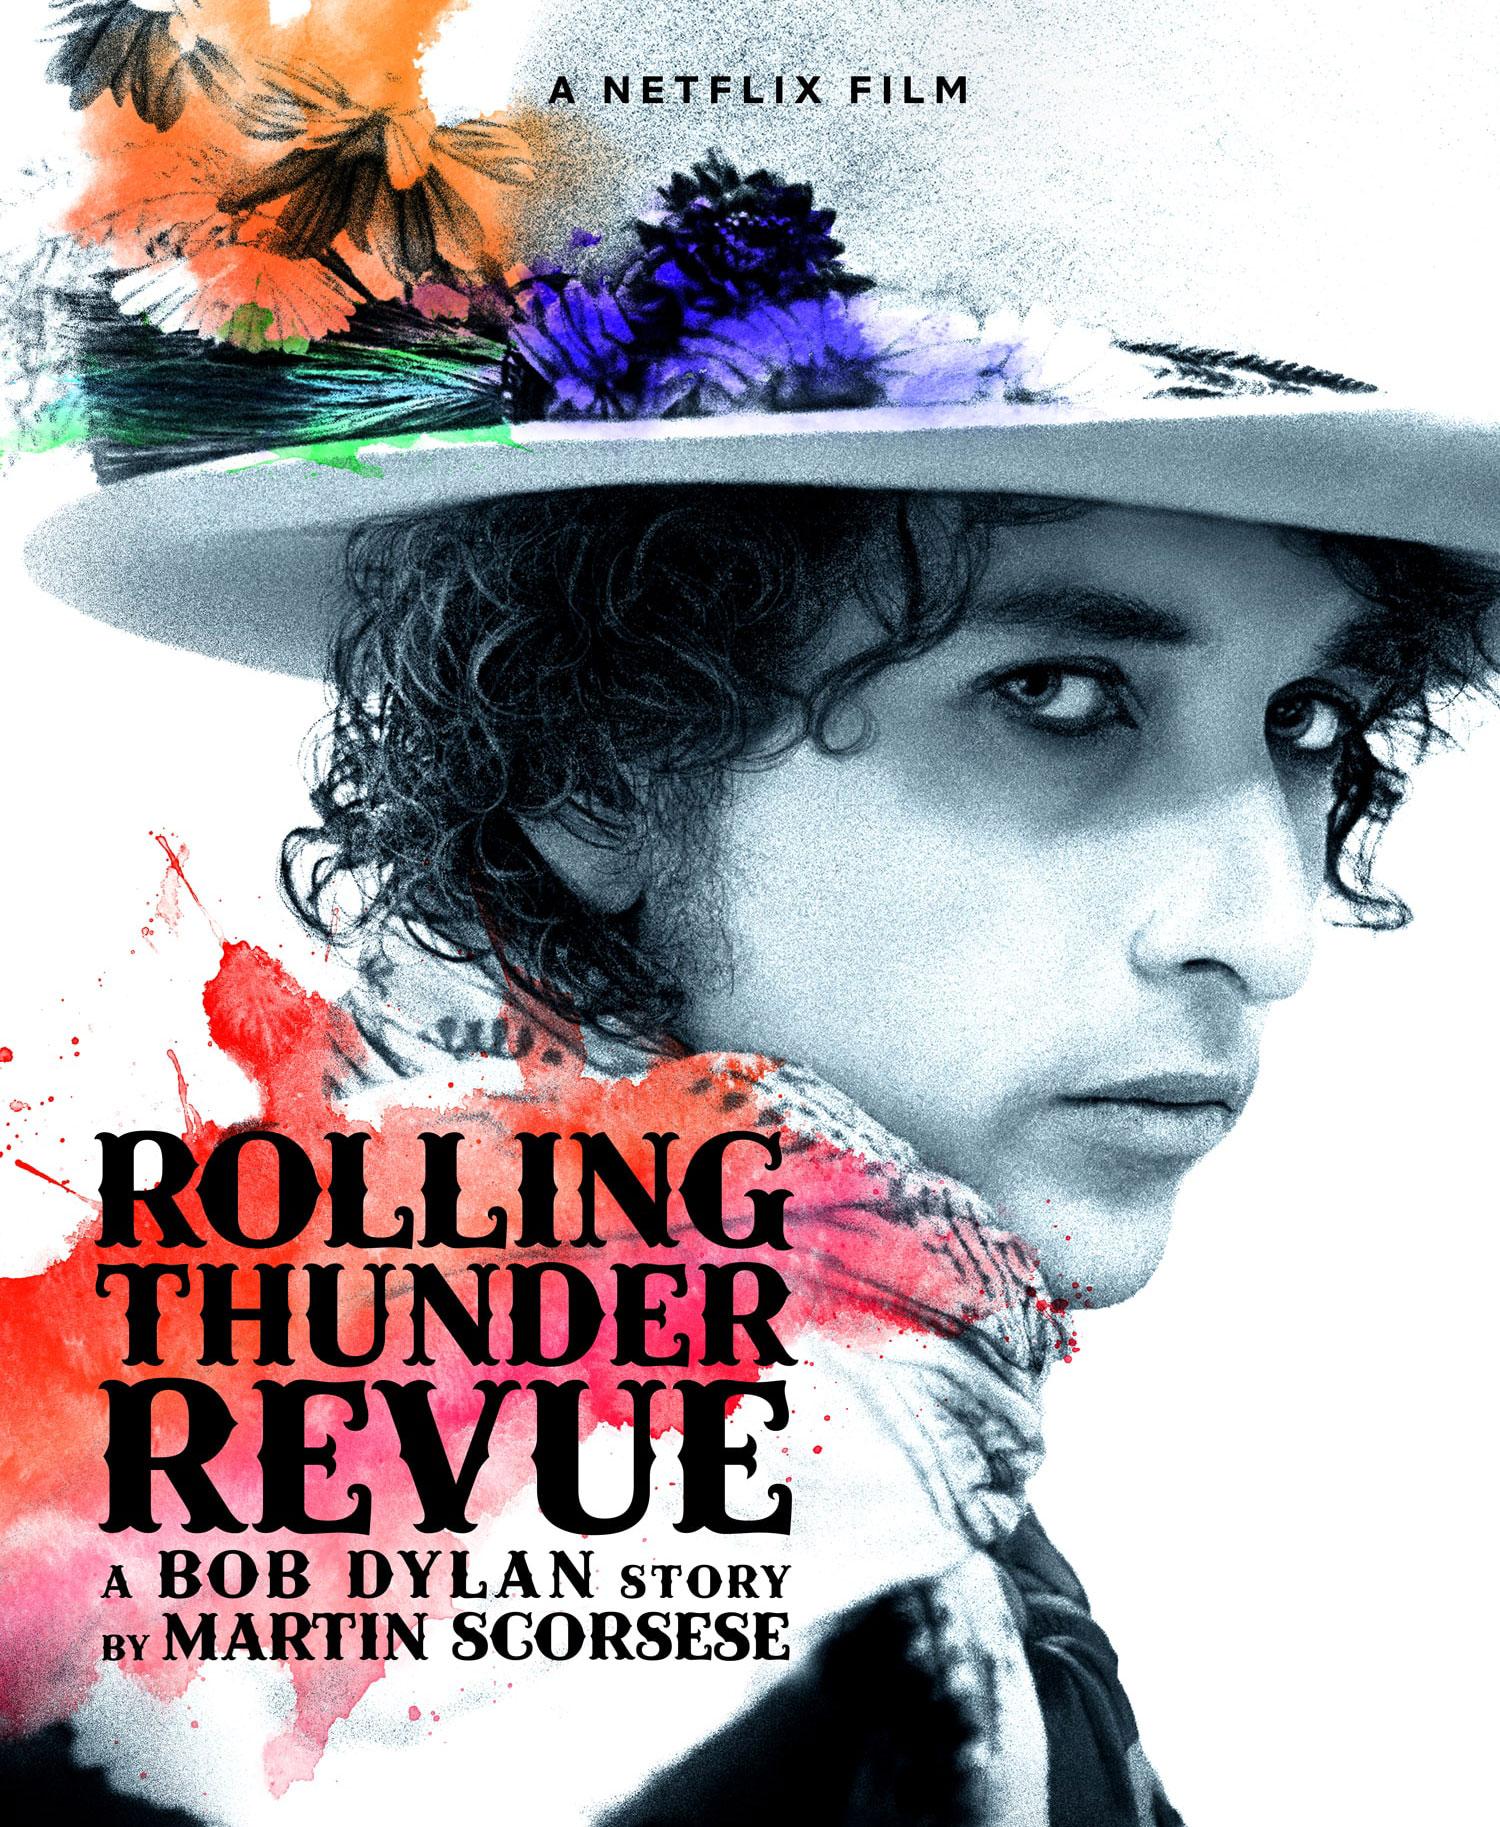 Rolling_Thunder_Revue_Vertical-Main_RGB_PRE-min_2.jpg